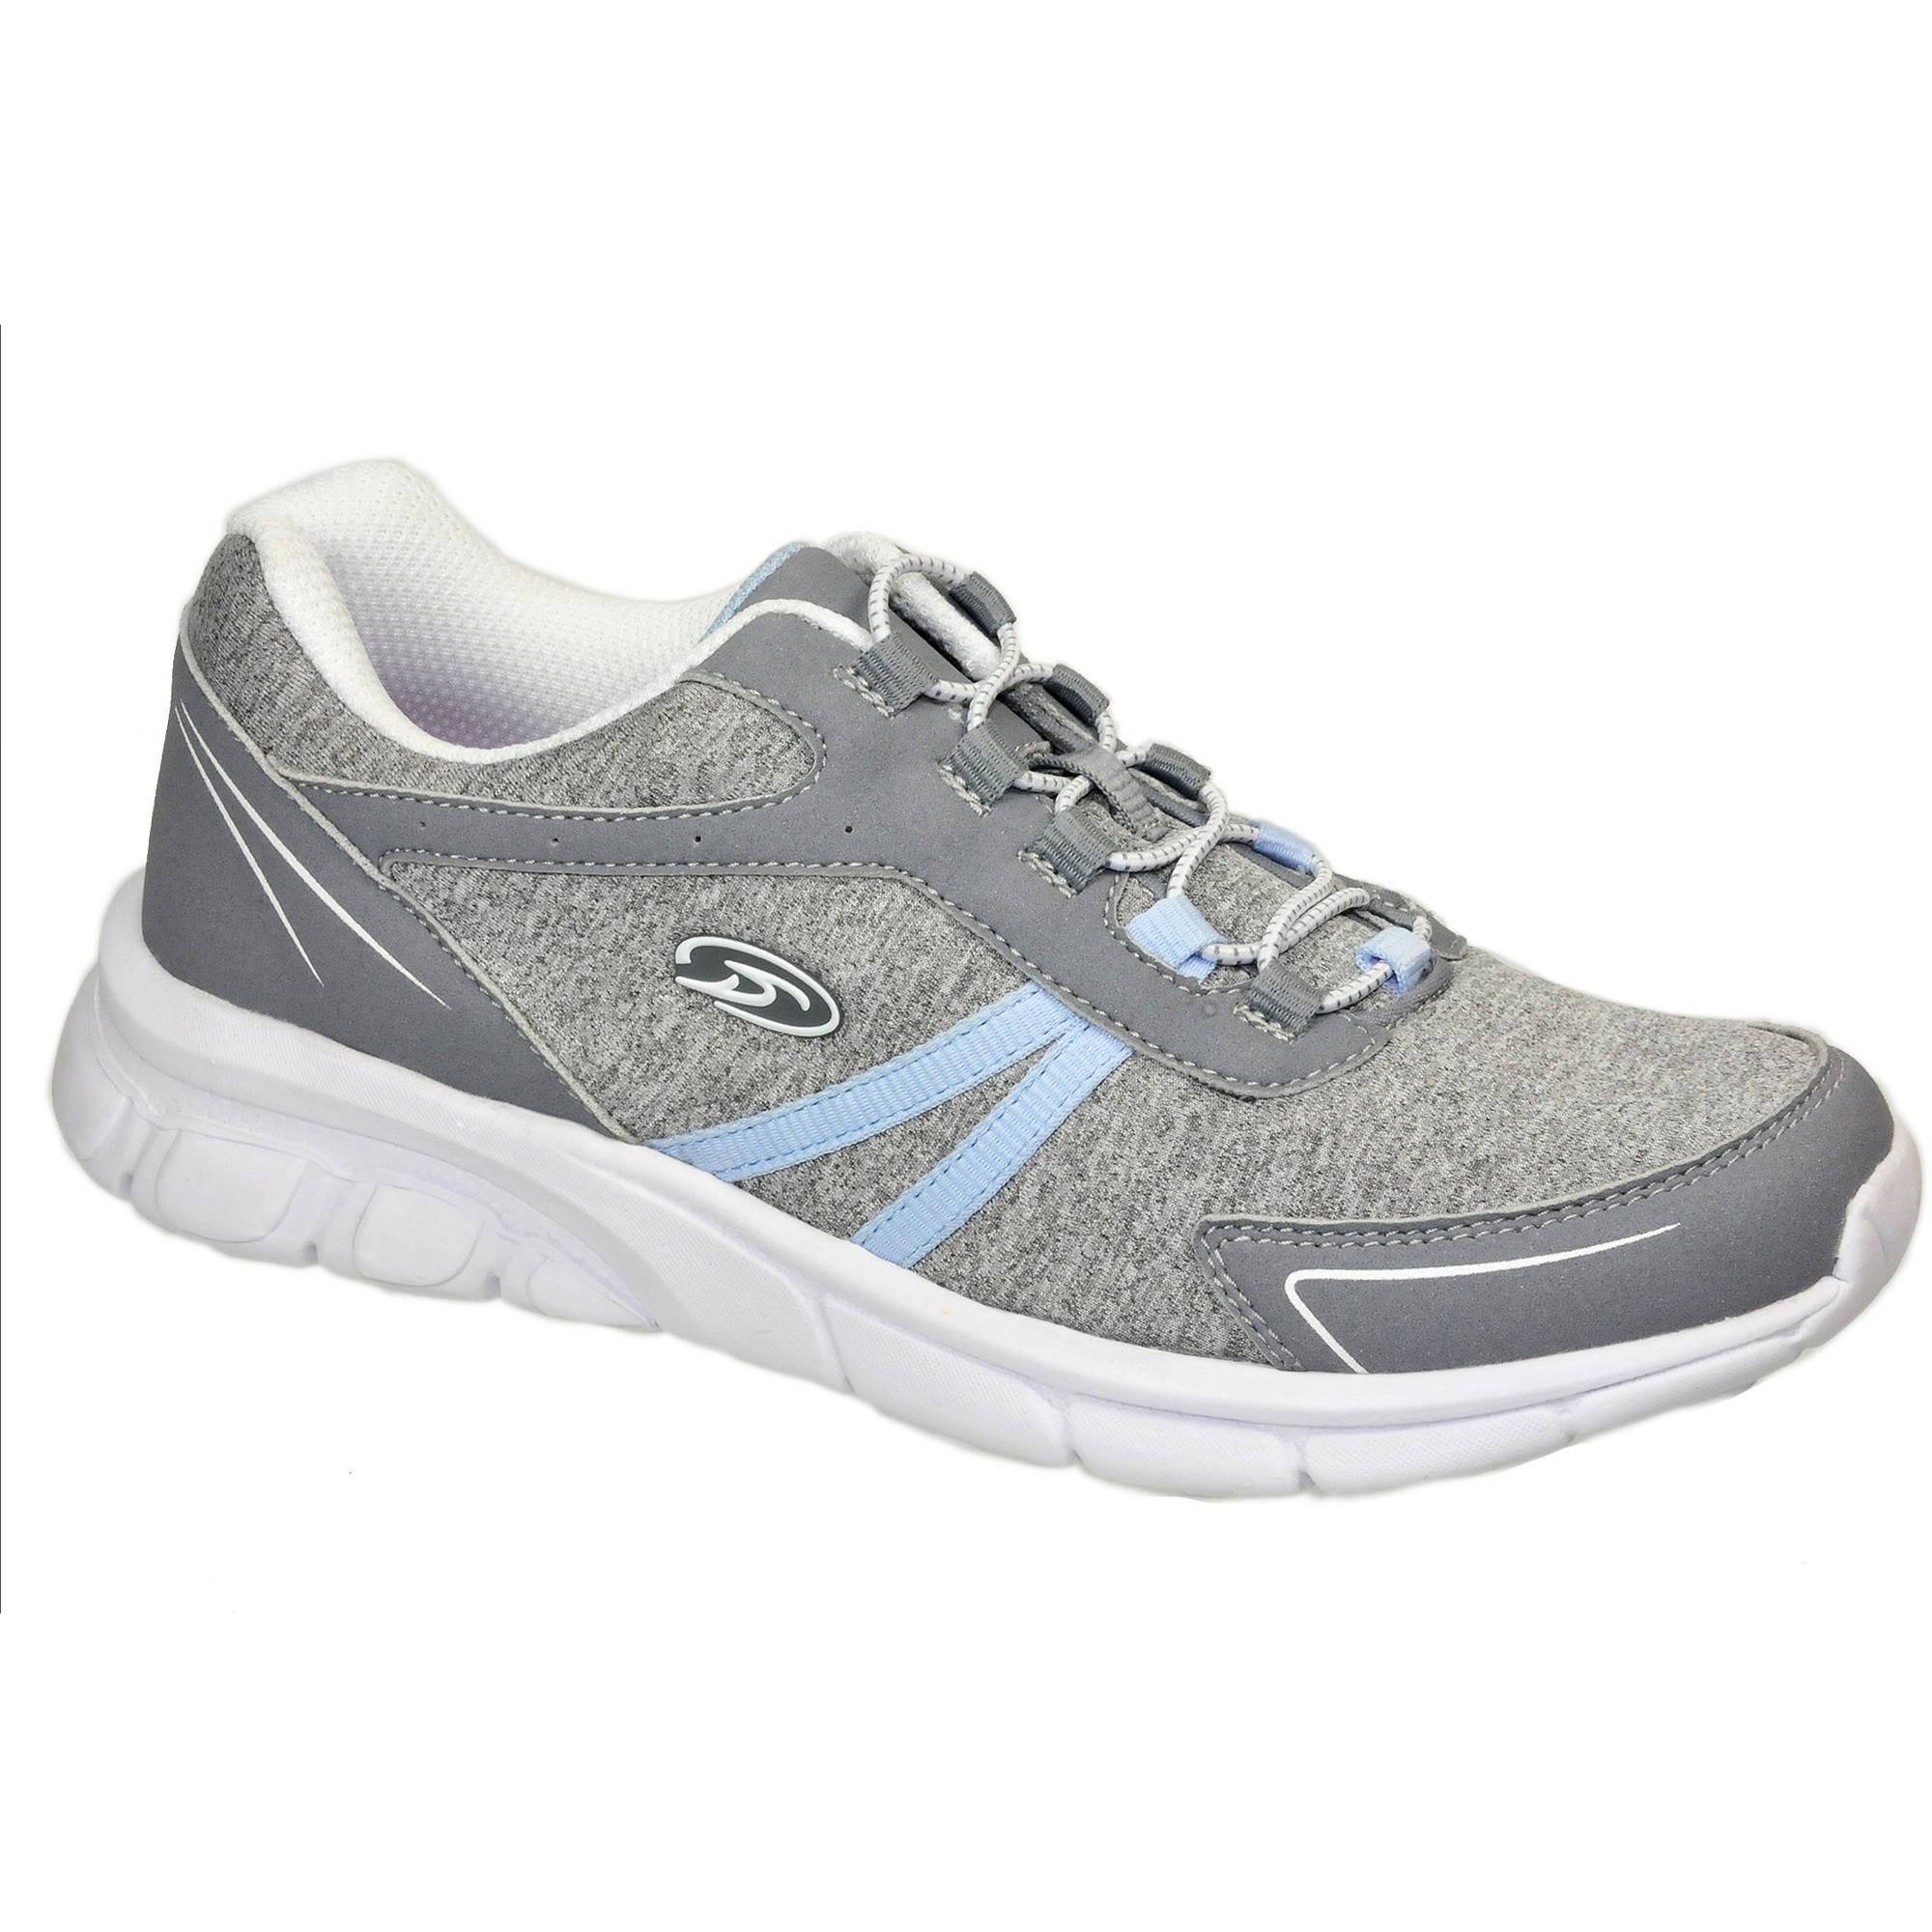 dr scholls s bright athletic shoe walmart